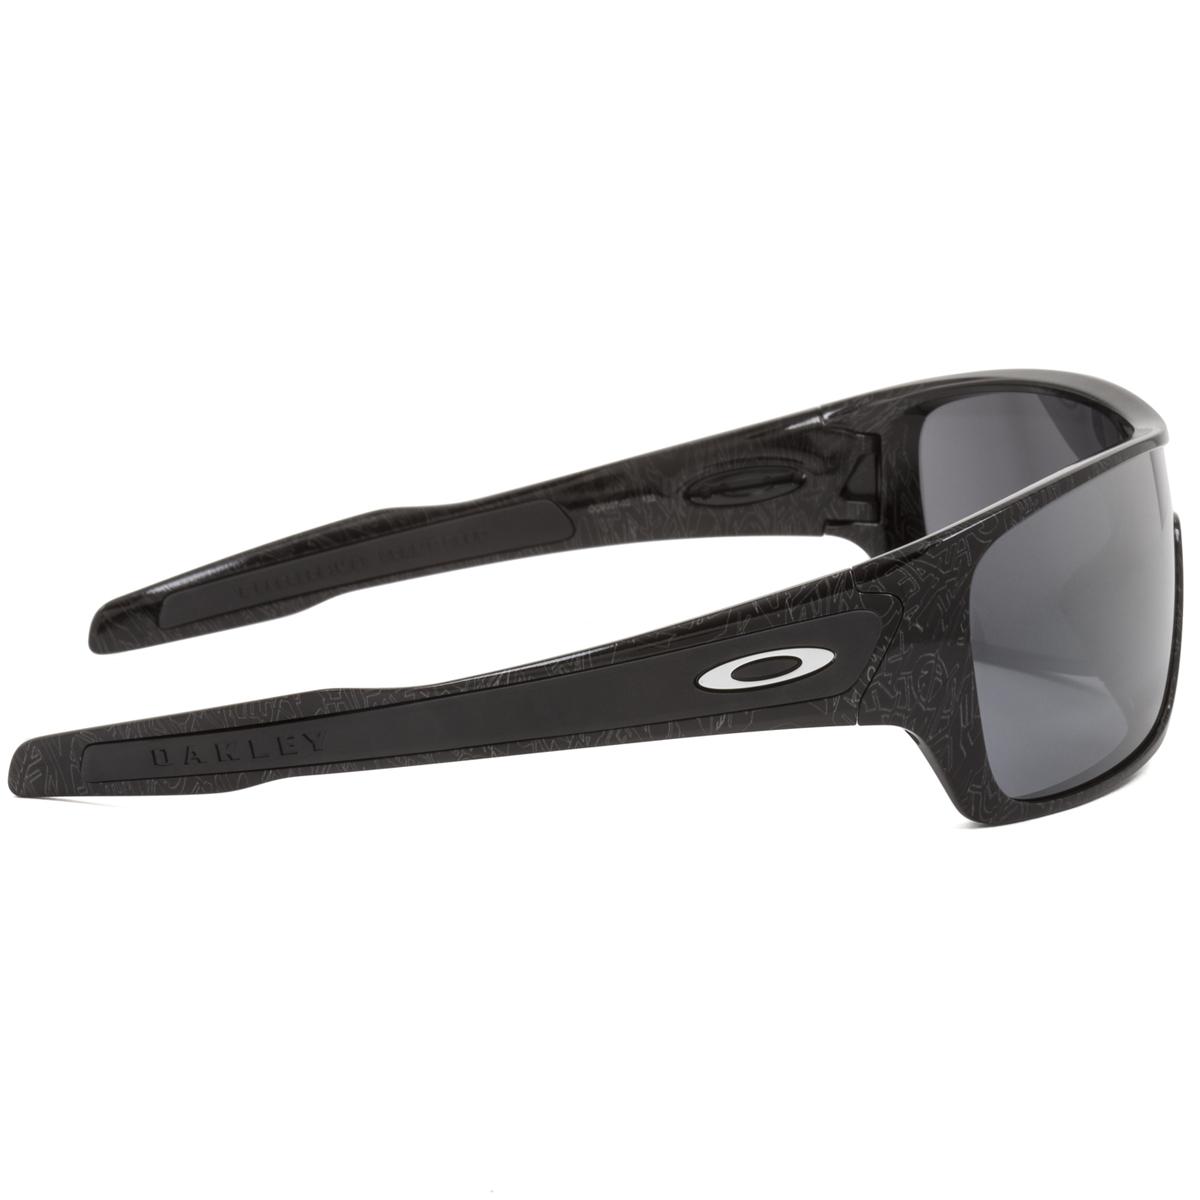 Óculos Oakley Turbine Rotor Black Lente Silver Ghost passe o mouse para ver  em zoom 85b6853c1d